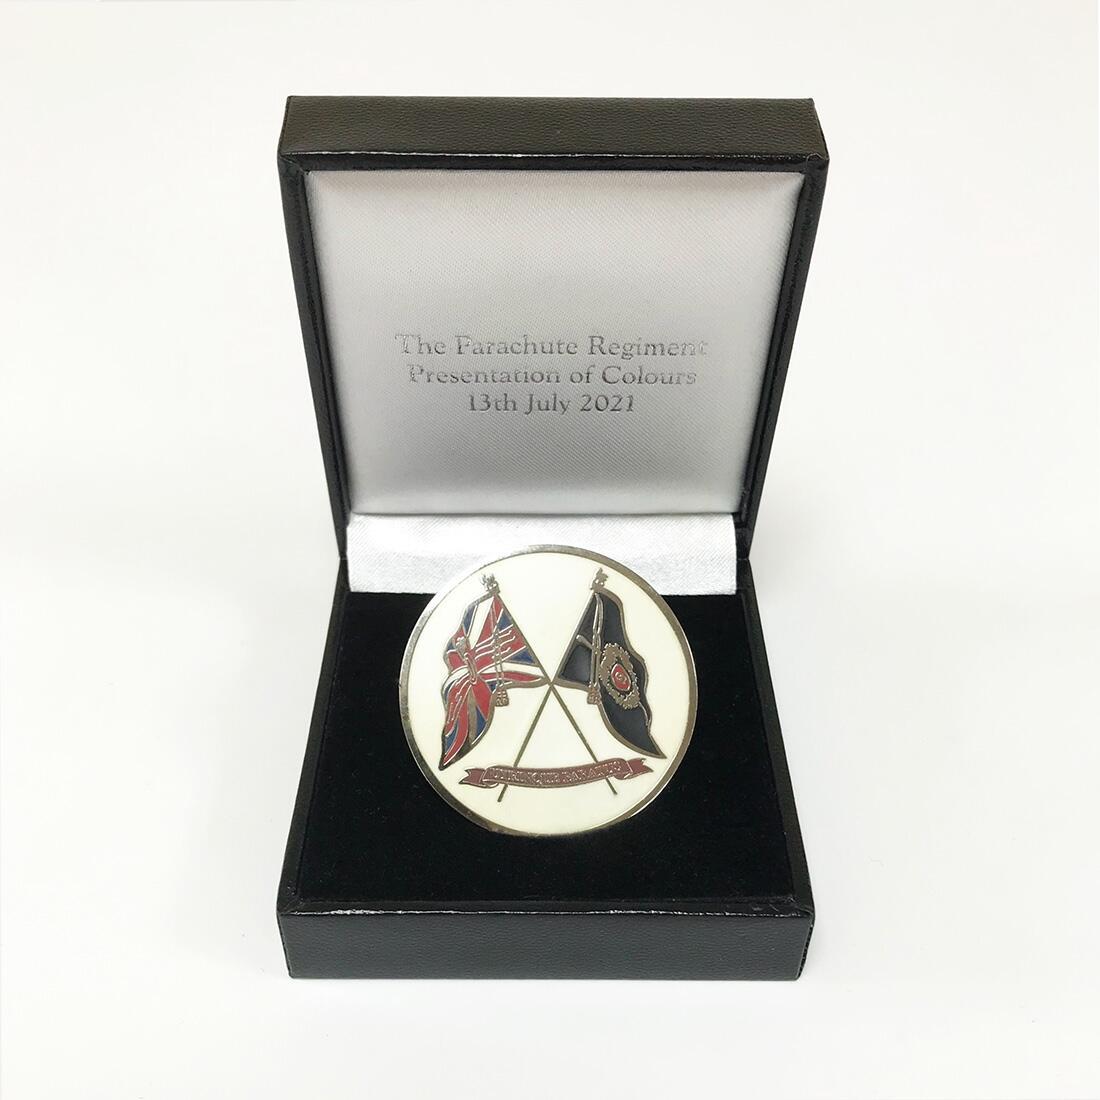 Challenge Coin in Presentation Box - Presentation of Colours 2021